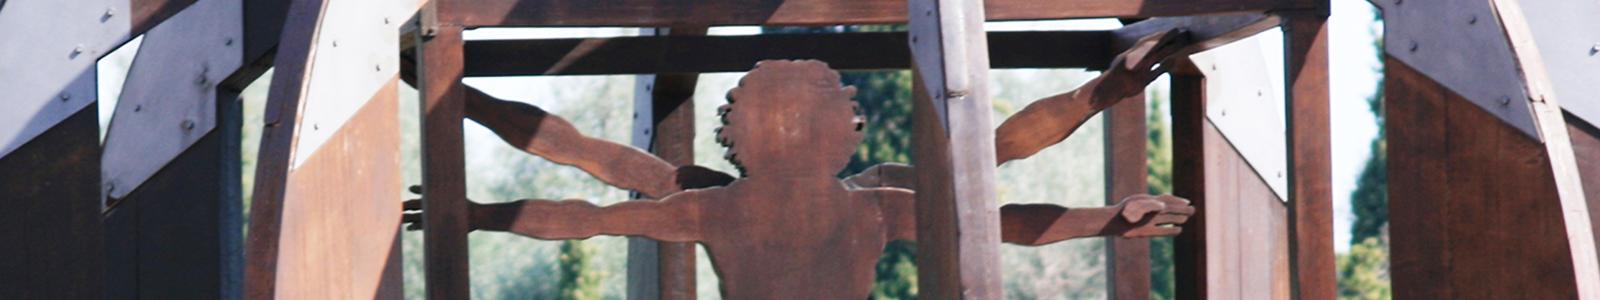 Mario Ceroli's The man from Vinci - Vinci Italy taglio OK